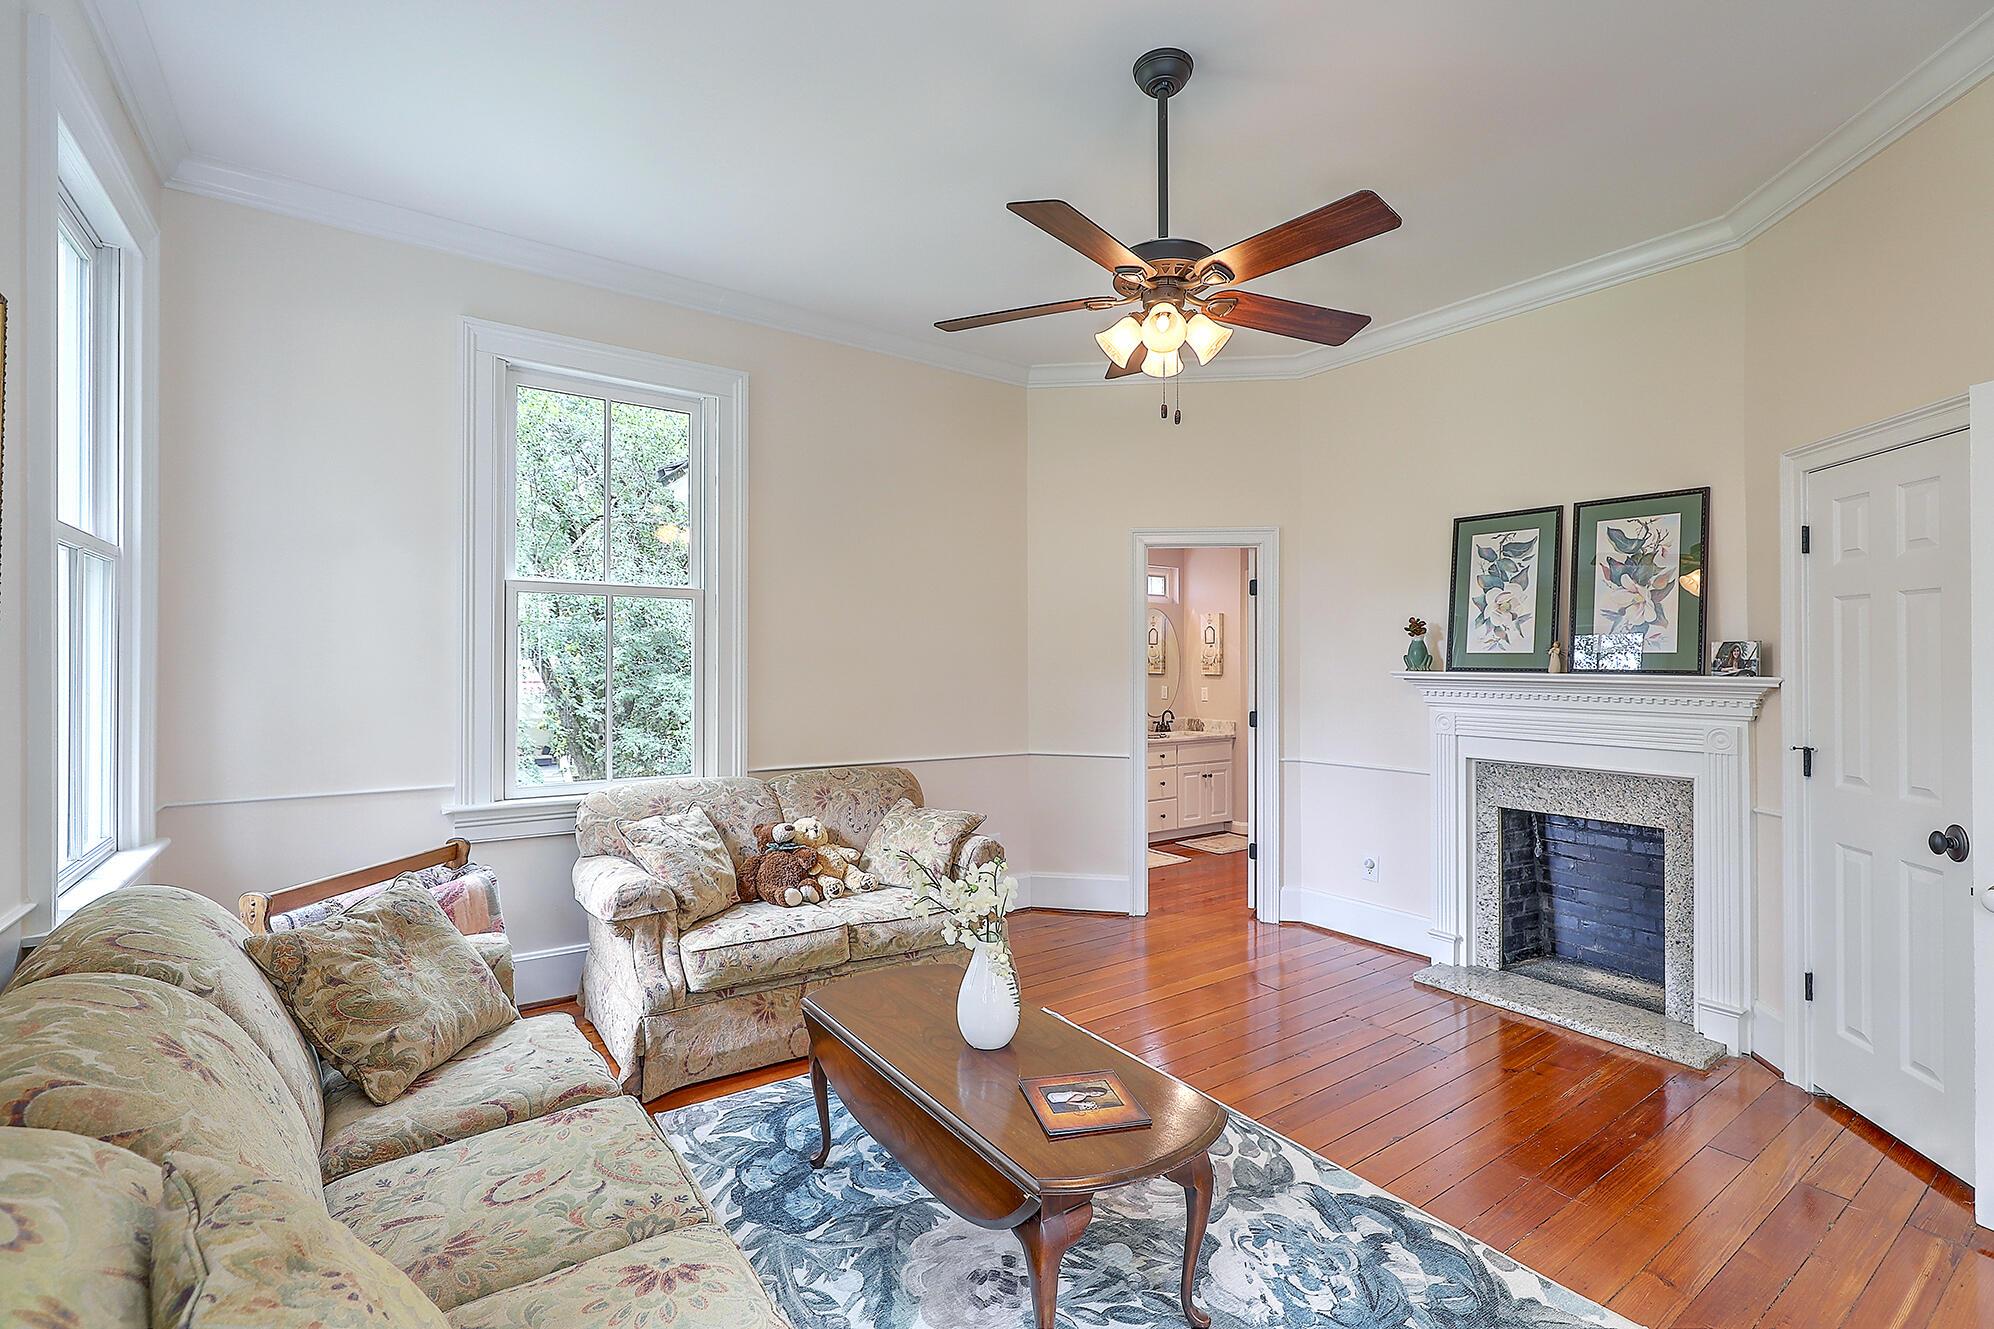 Summerville Homes For Sale - 102 Hickory, Summerville, SC - 93